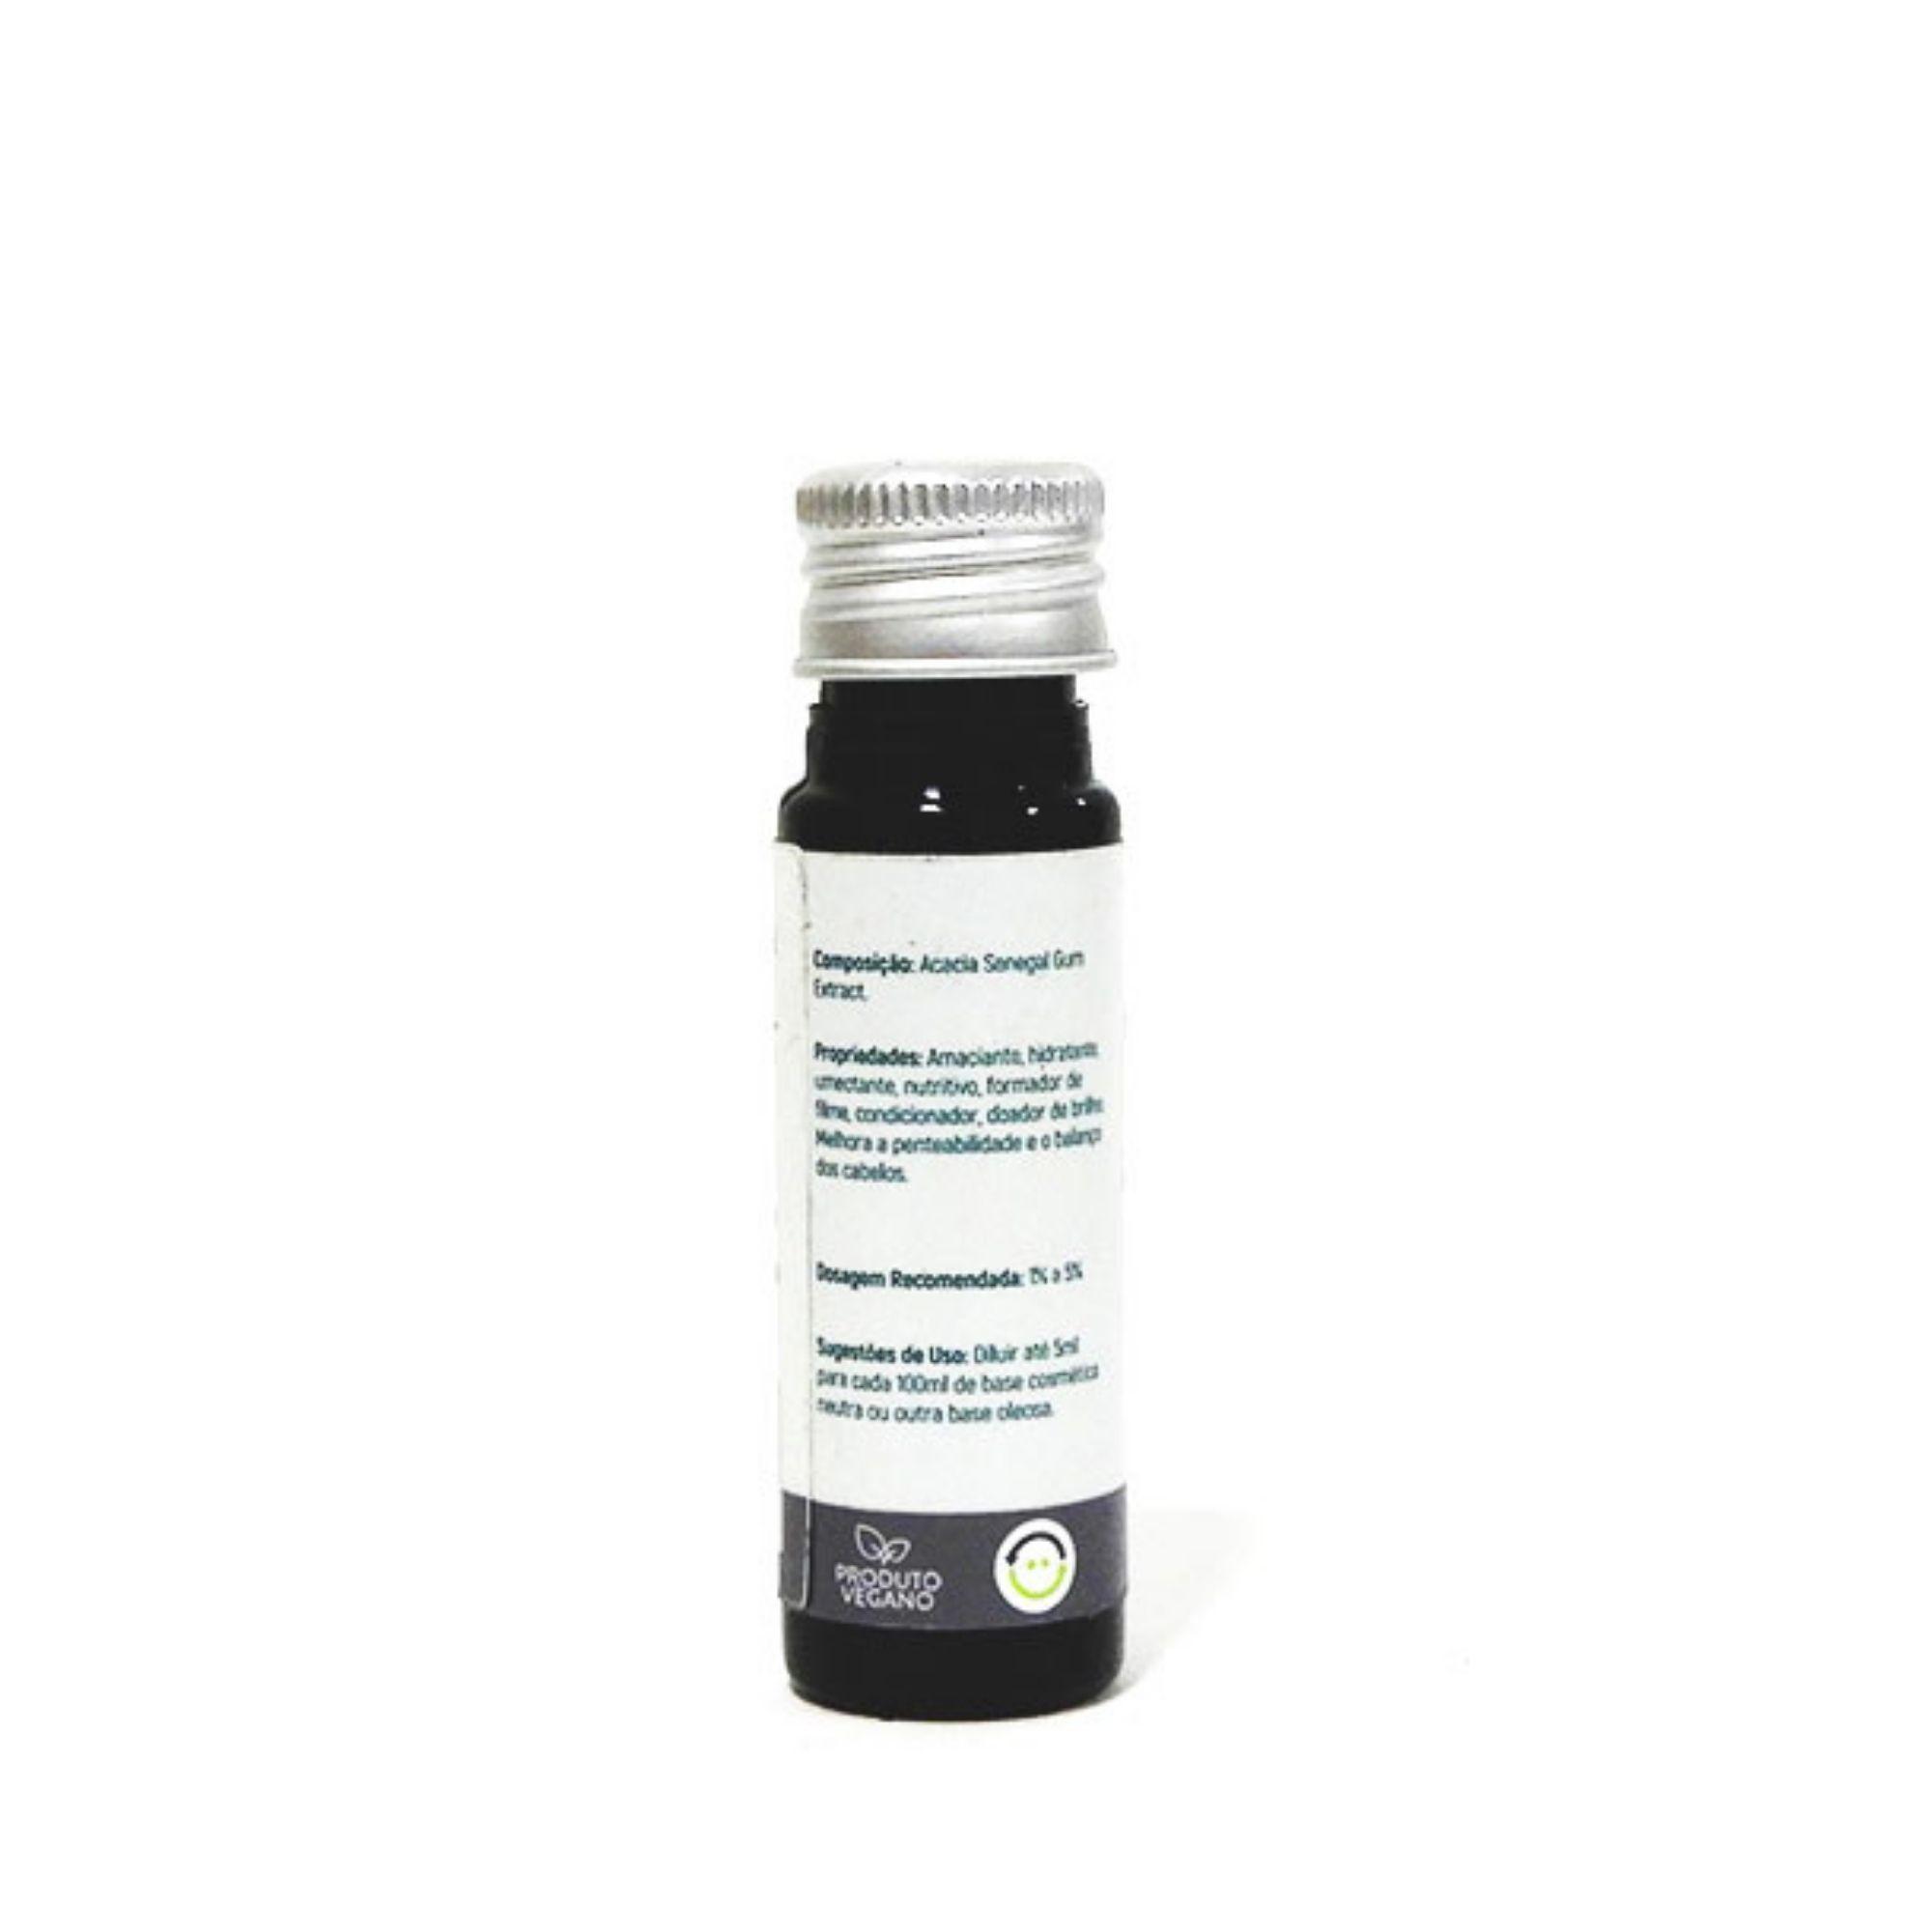 Colágeno Hidrolisado Vegetal (Líquido) - 10ml  - Flora Fiora PRO